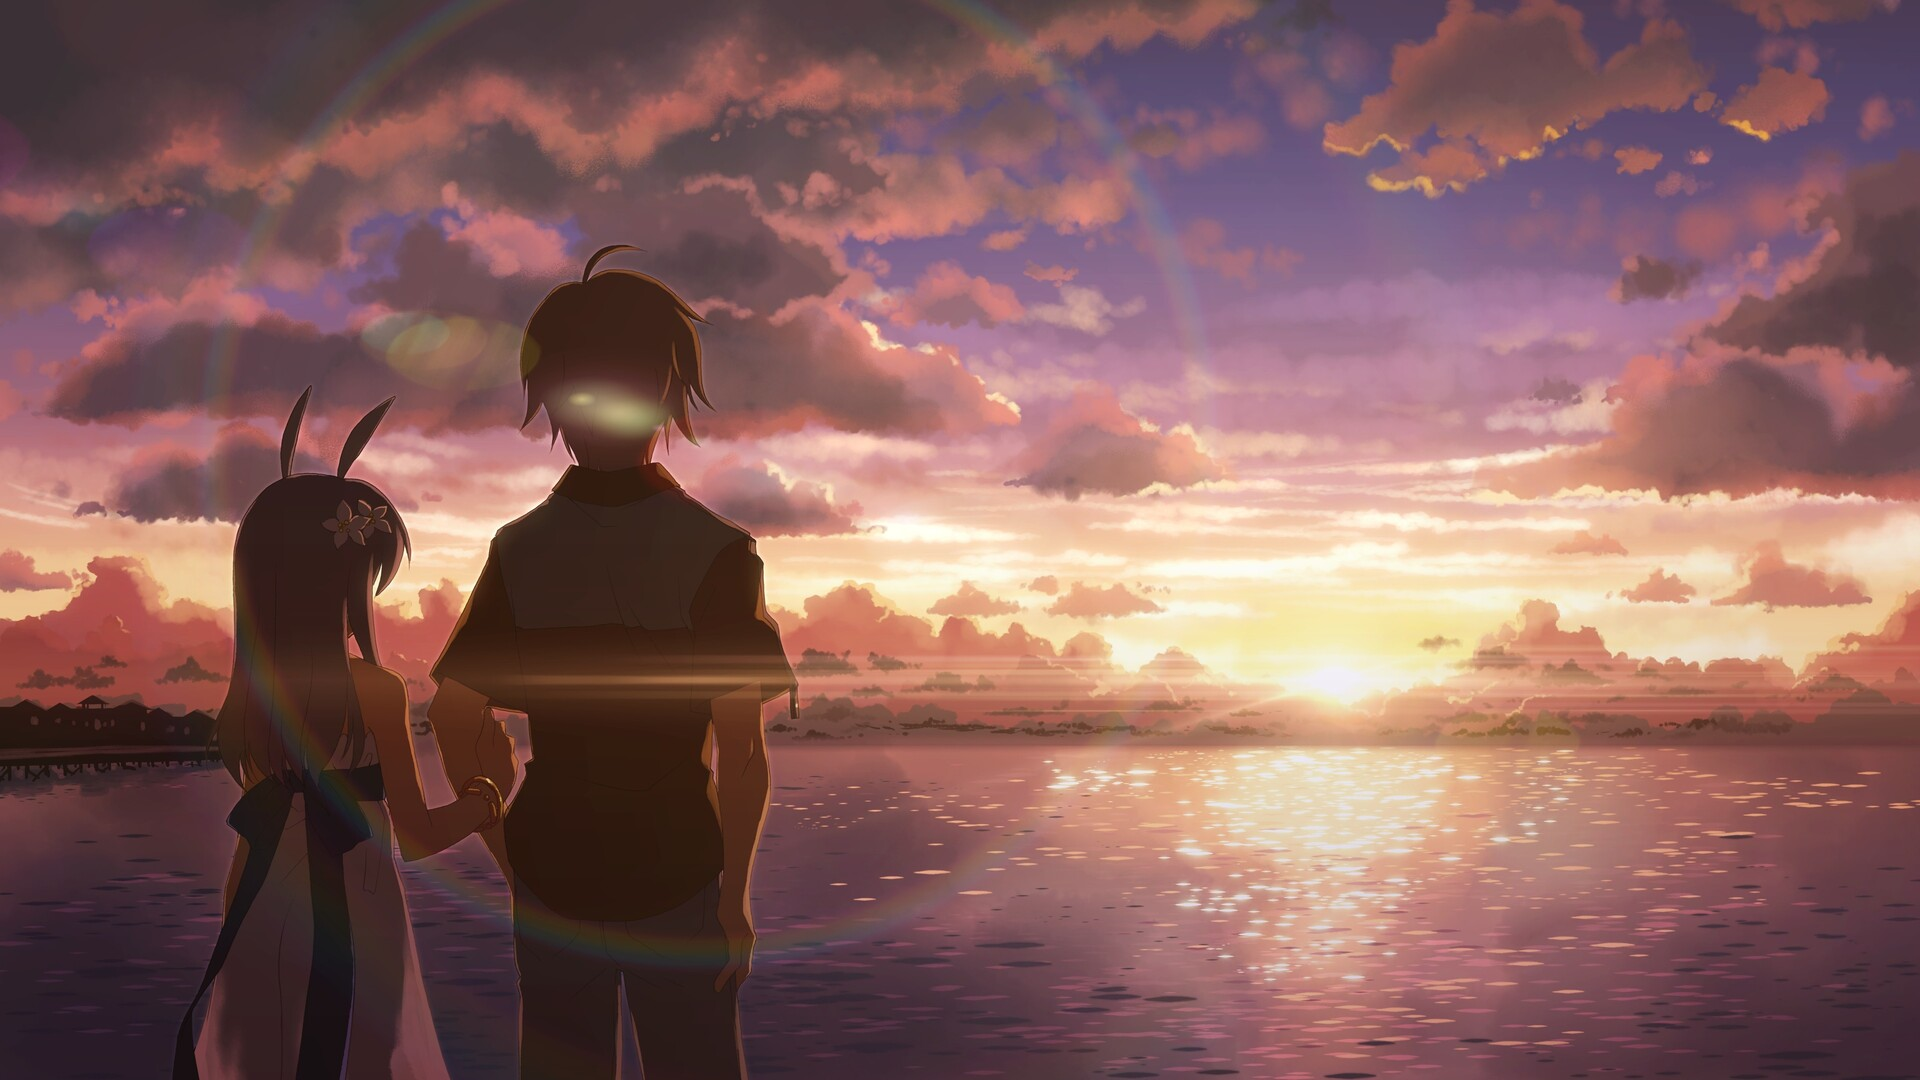 1920x1080 Anime Boy And Girl Alone Laptop Full Hd 1080p Hd 4k